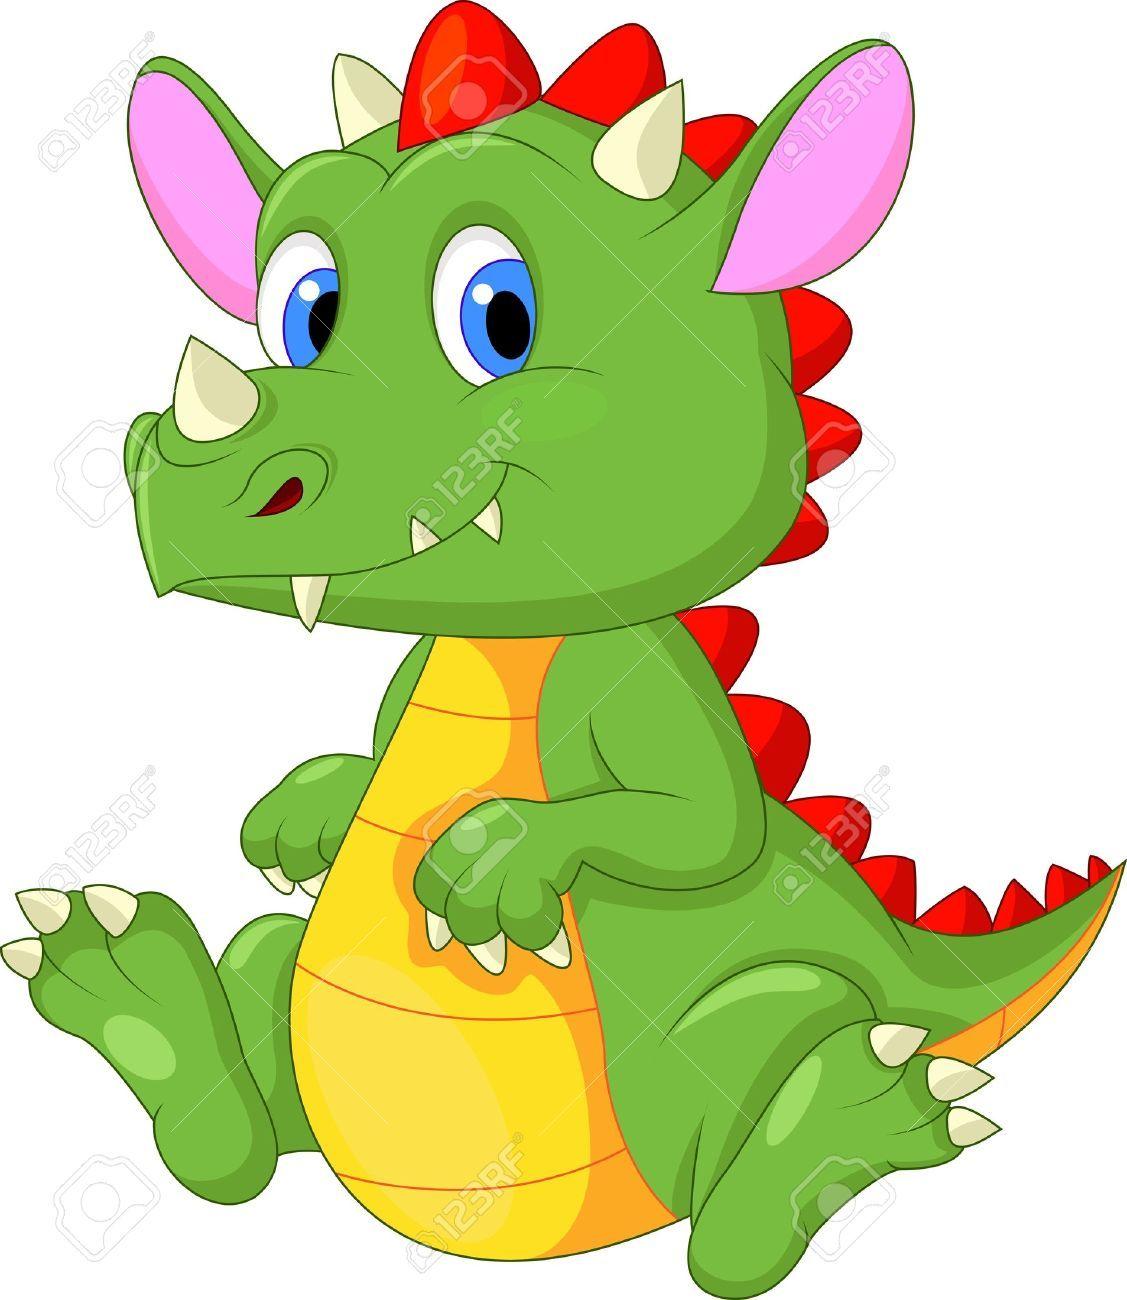 1127x1300 Cute Baby Dragon Cartoon Royalty Free Cliparts, Vectors, And Stock